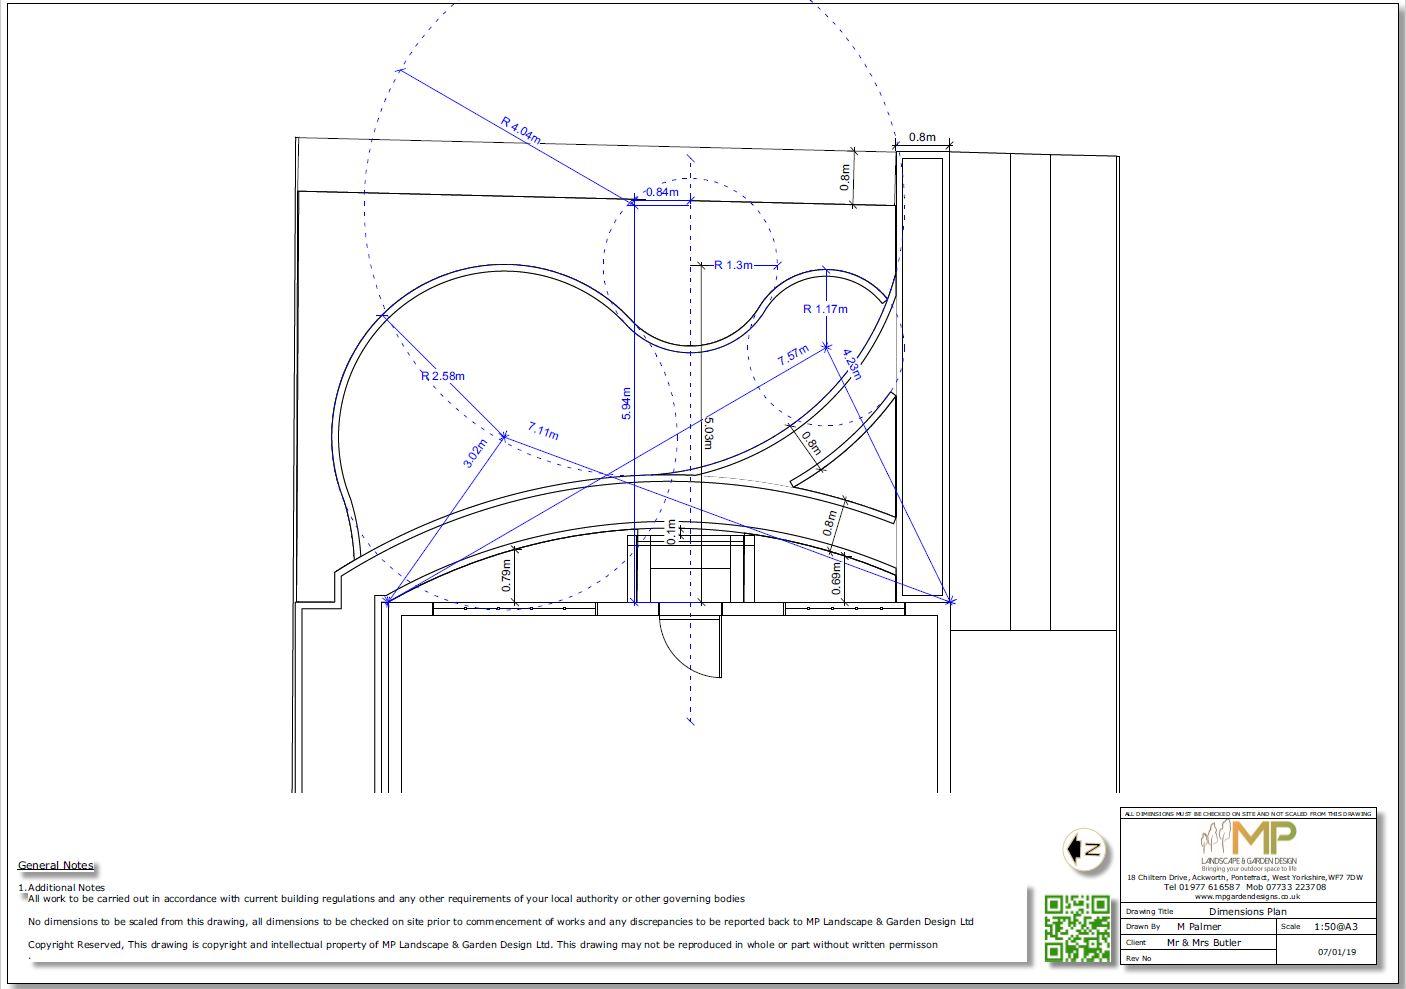 Garden design dimensions plan for a front garden in Ackworth, Pontefract.